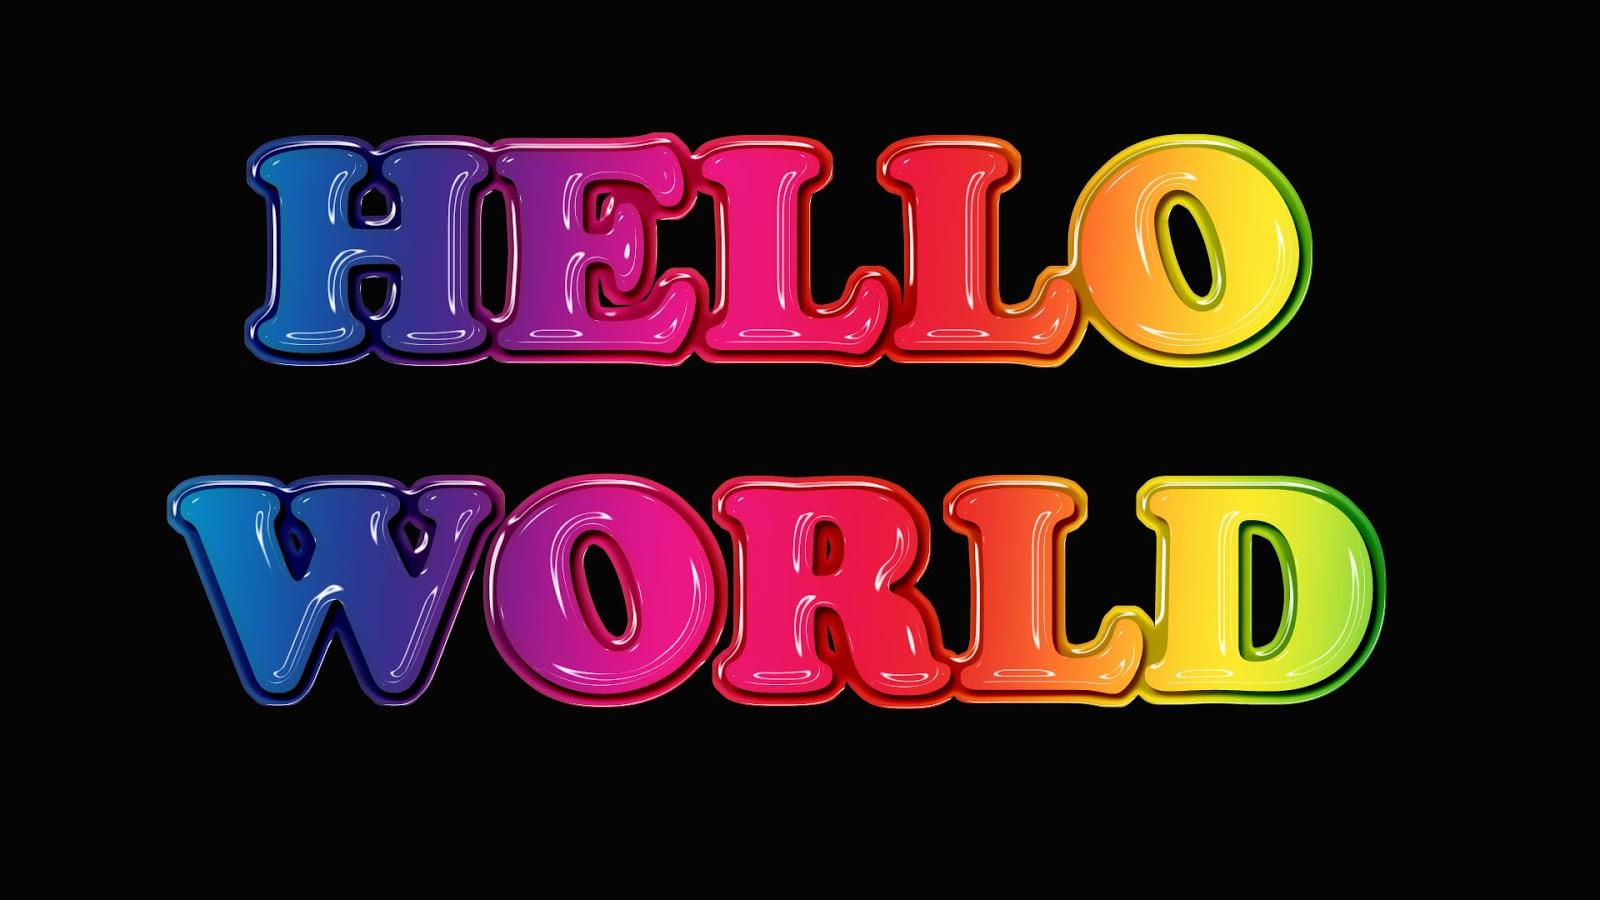 Photoshop Portfolio: Text Design 3 - Glossy Molded Plastic